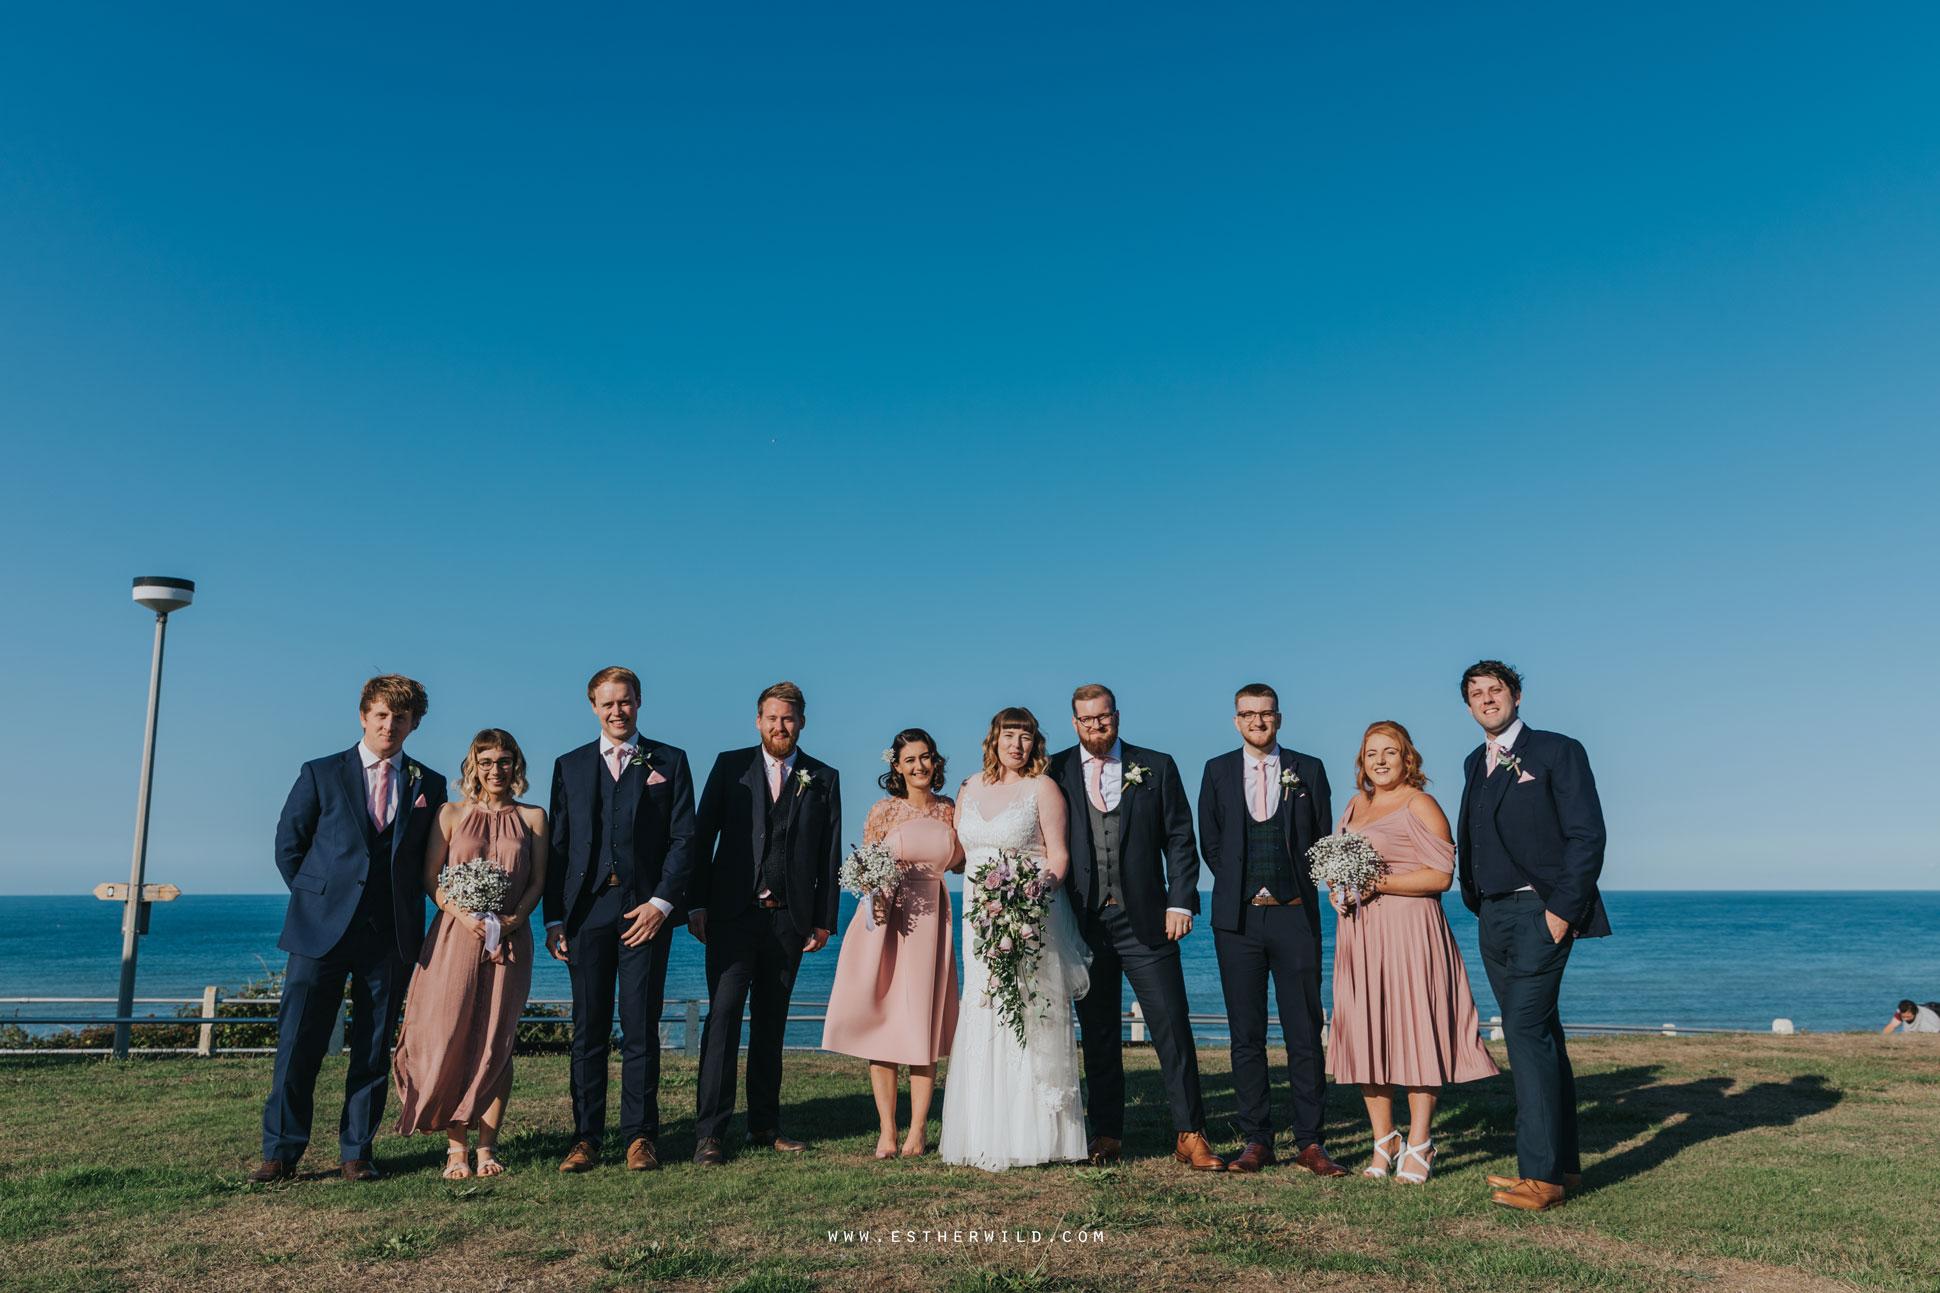 Cromer_Wedding_Beach_Outdoor_Ceremony_Norfolk_North_Lodge_Registry_Office_Rocket_House_Cafe_Cromer_Pier_IMG_4454.jpg